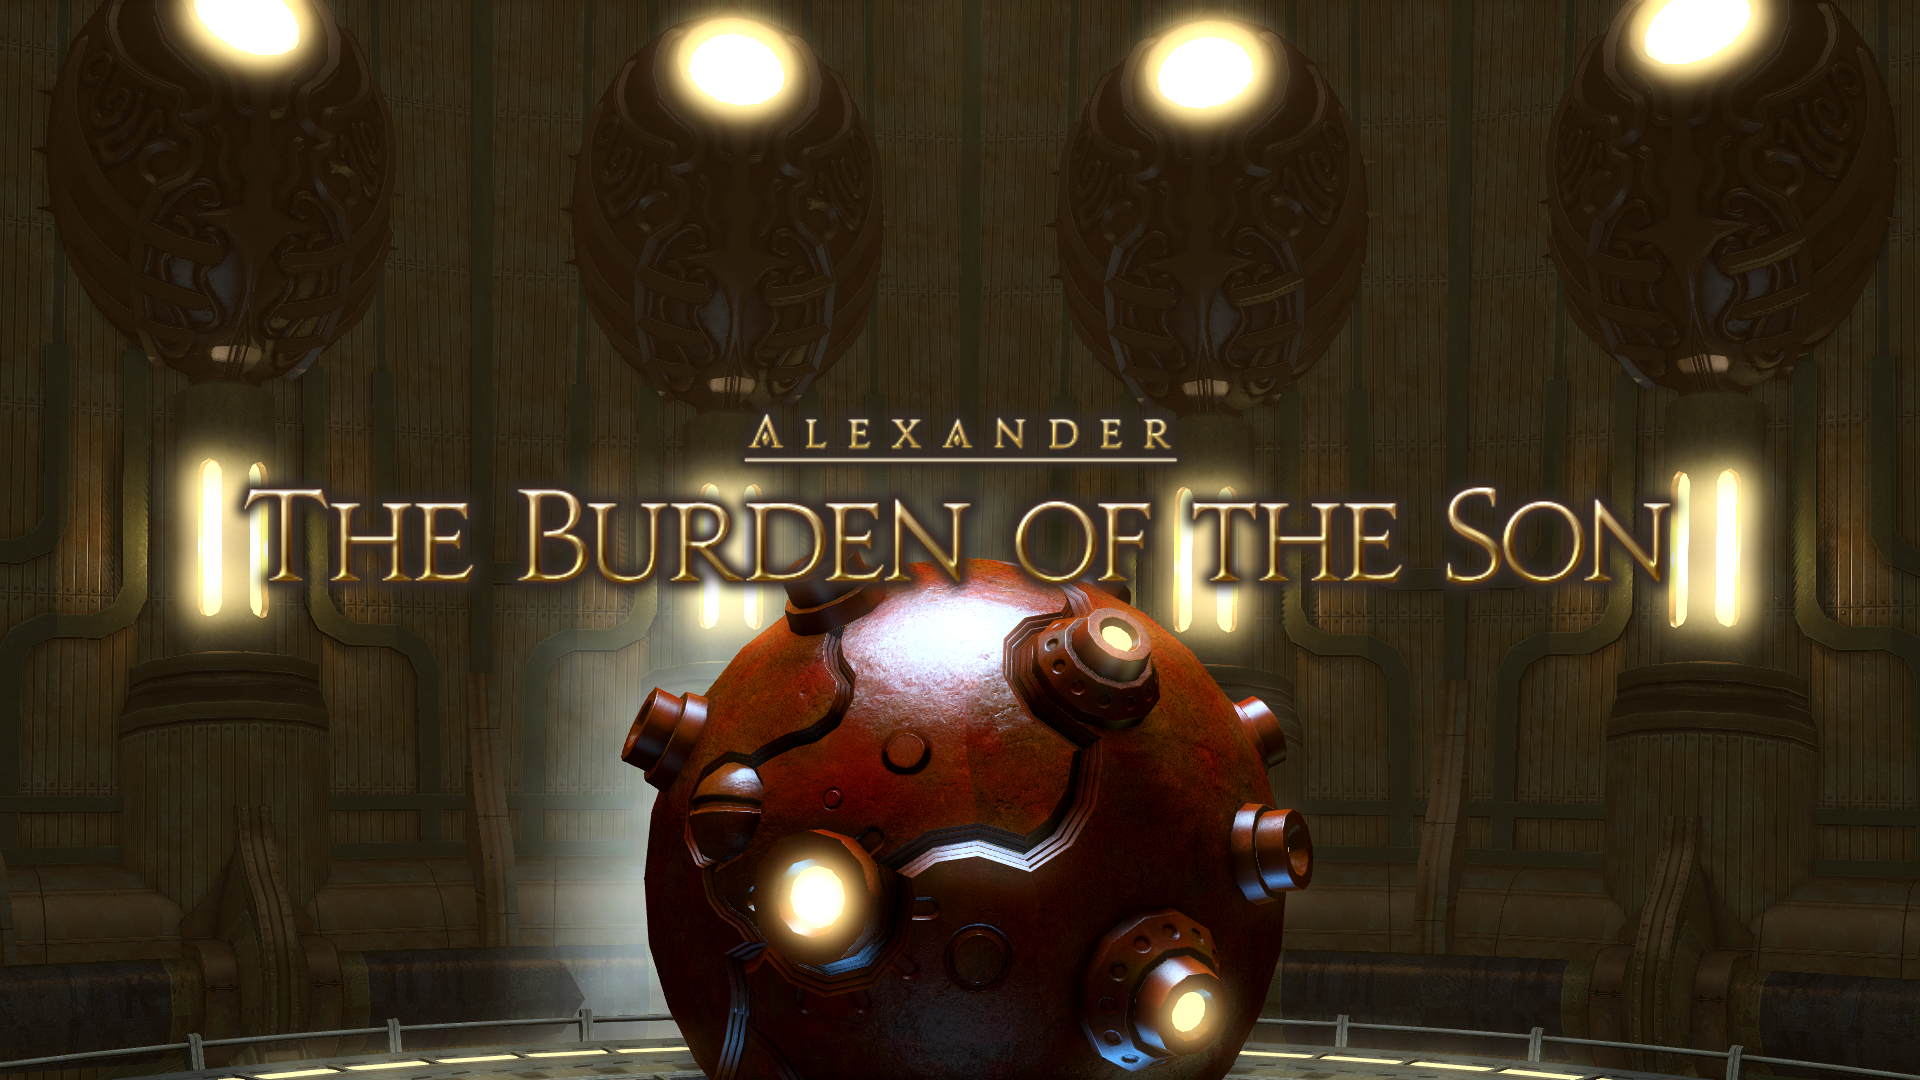 Alexander - The Burden of the Son | Final Fantasy Wiki | FANDOM